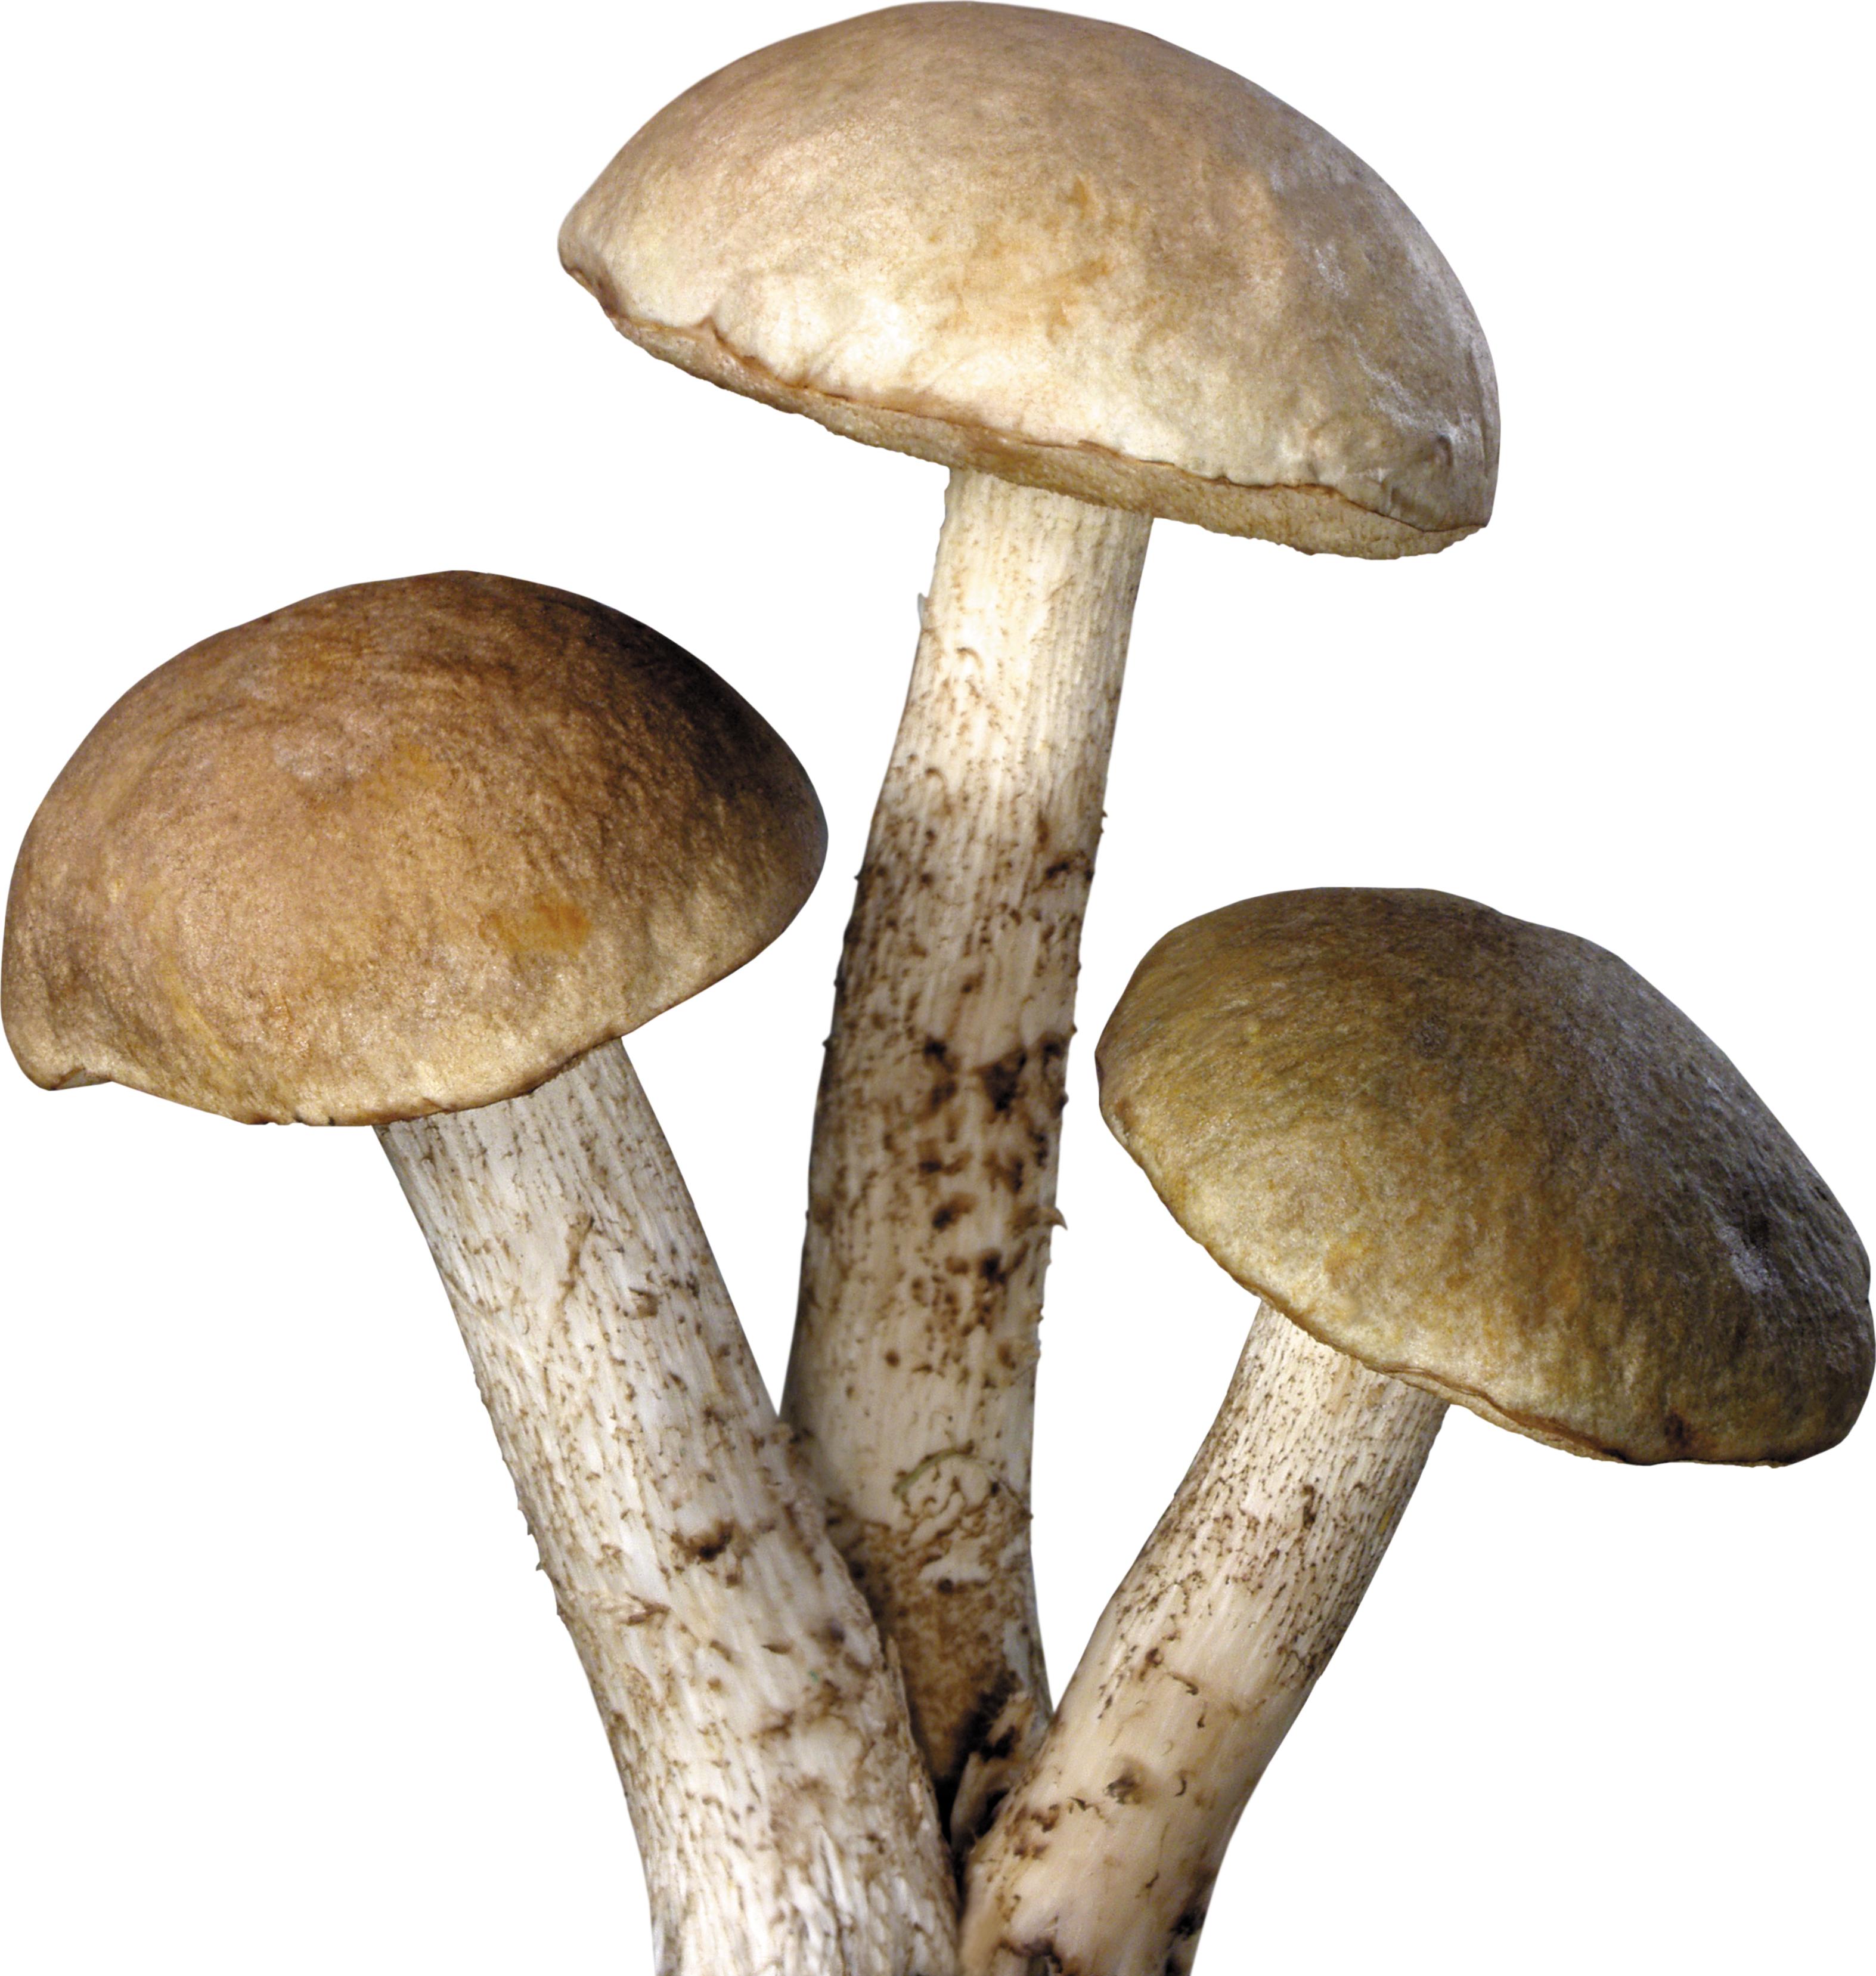 Mushroom PNG image - Toadstool PNG HD